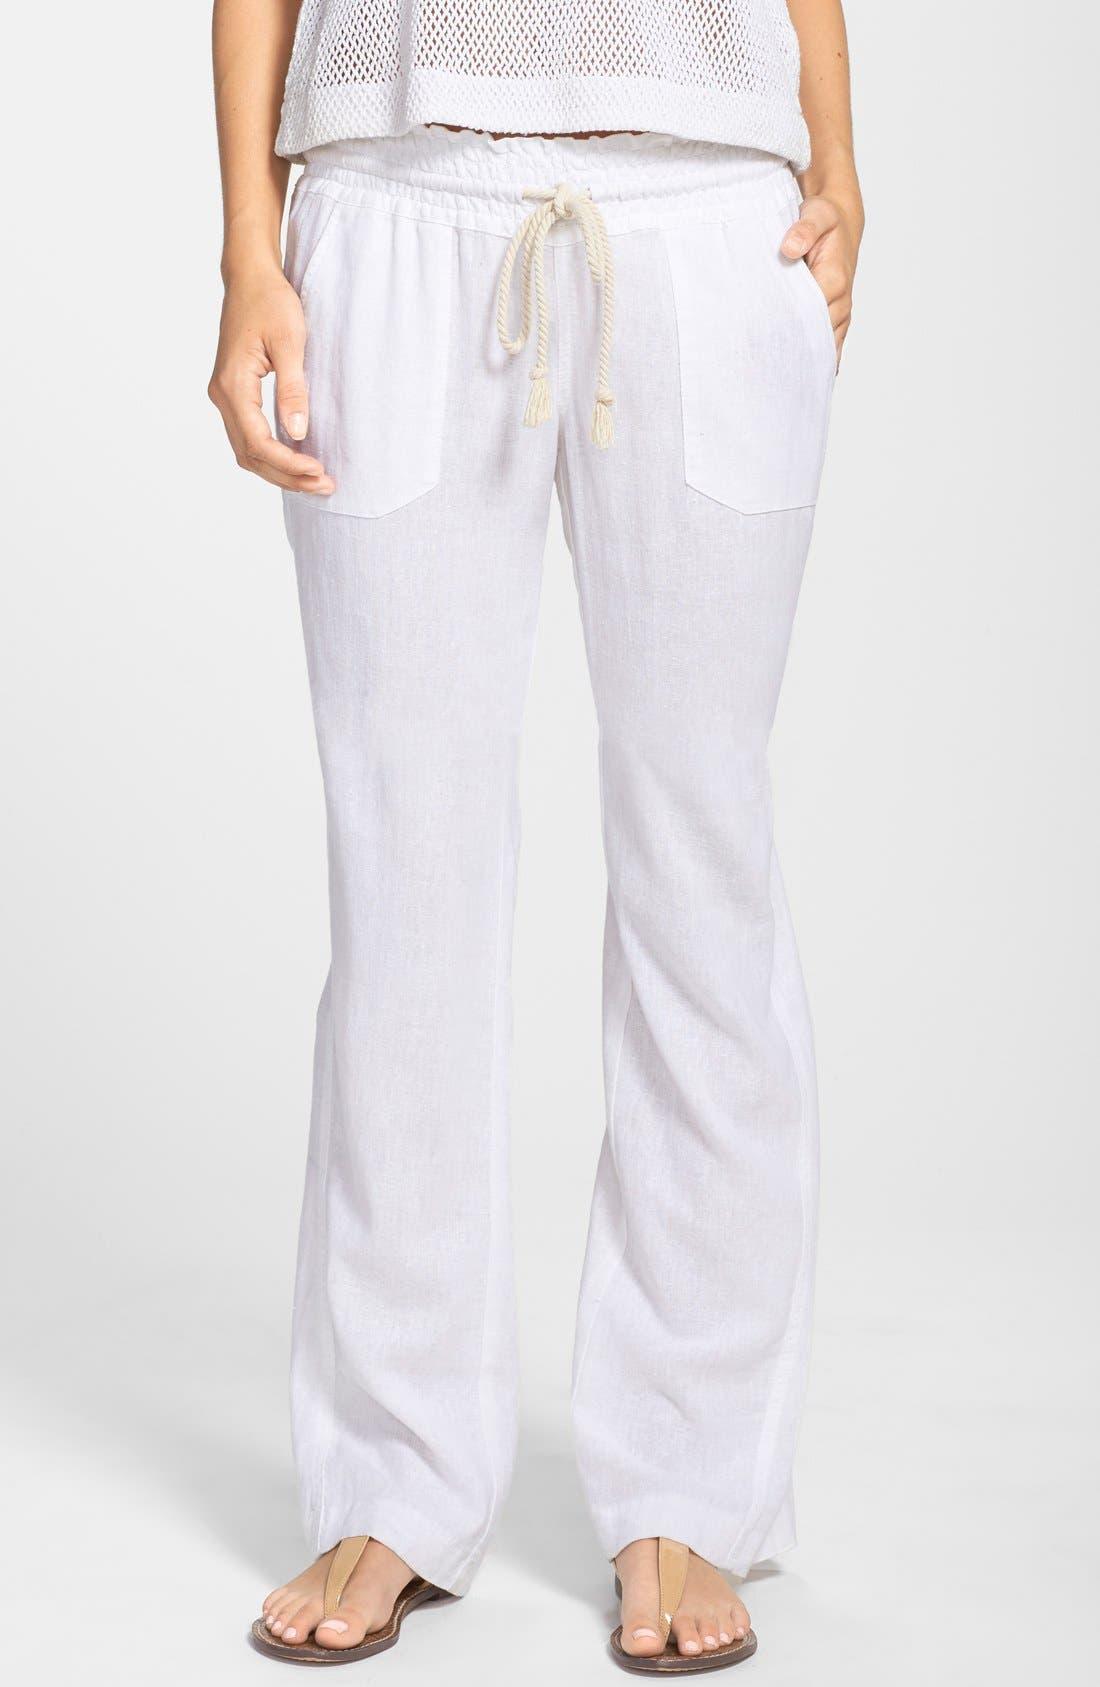 Women's Roxy Oceanside Linen Blend Beach Pants